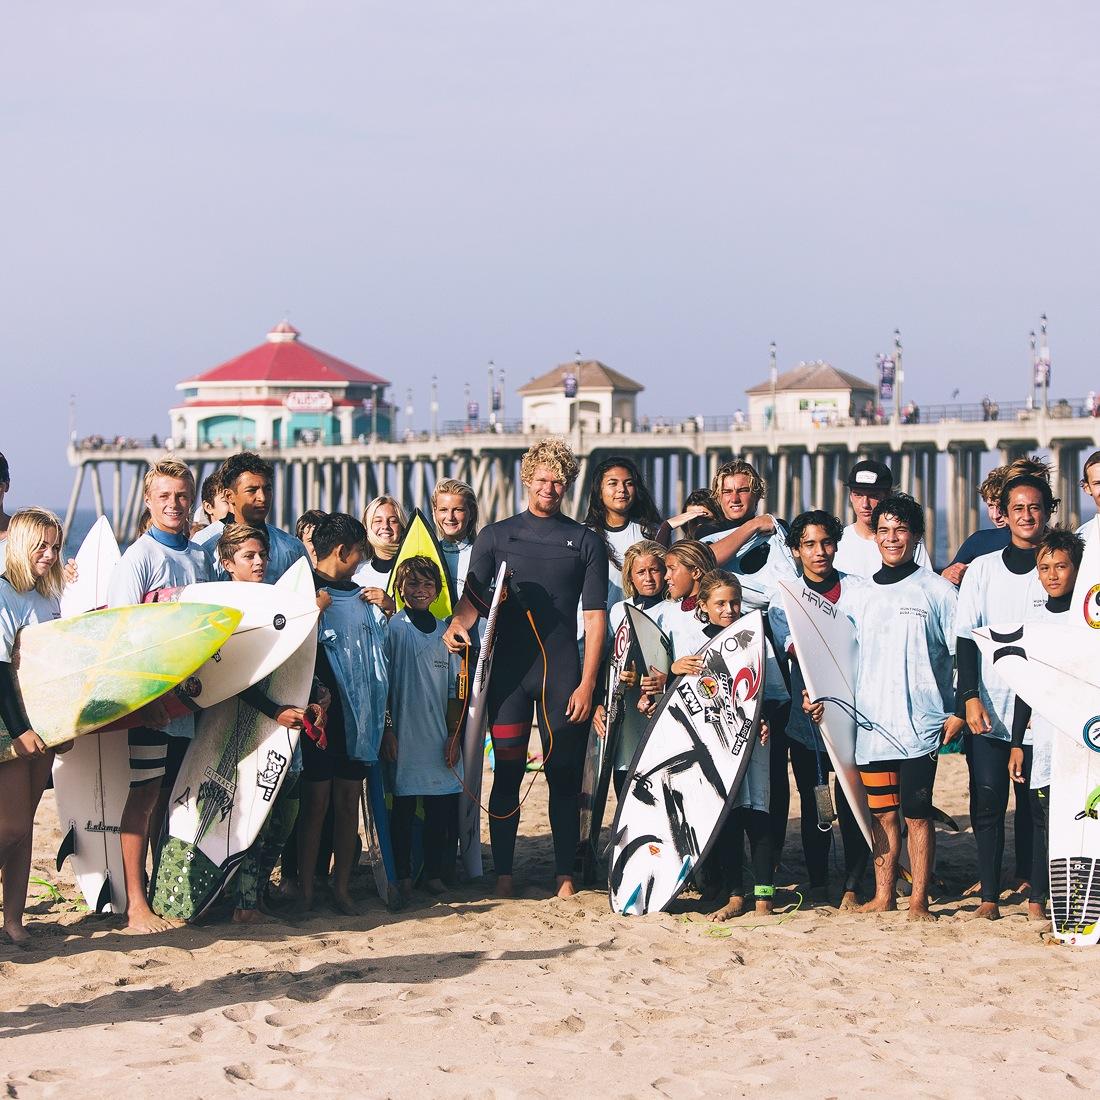 John John surfed at the Huntington Beach Pier